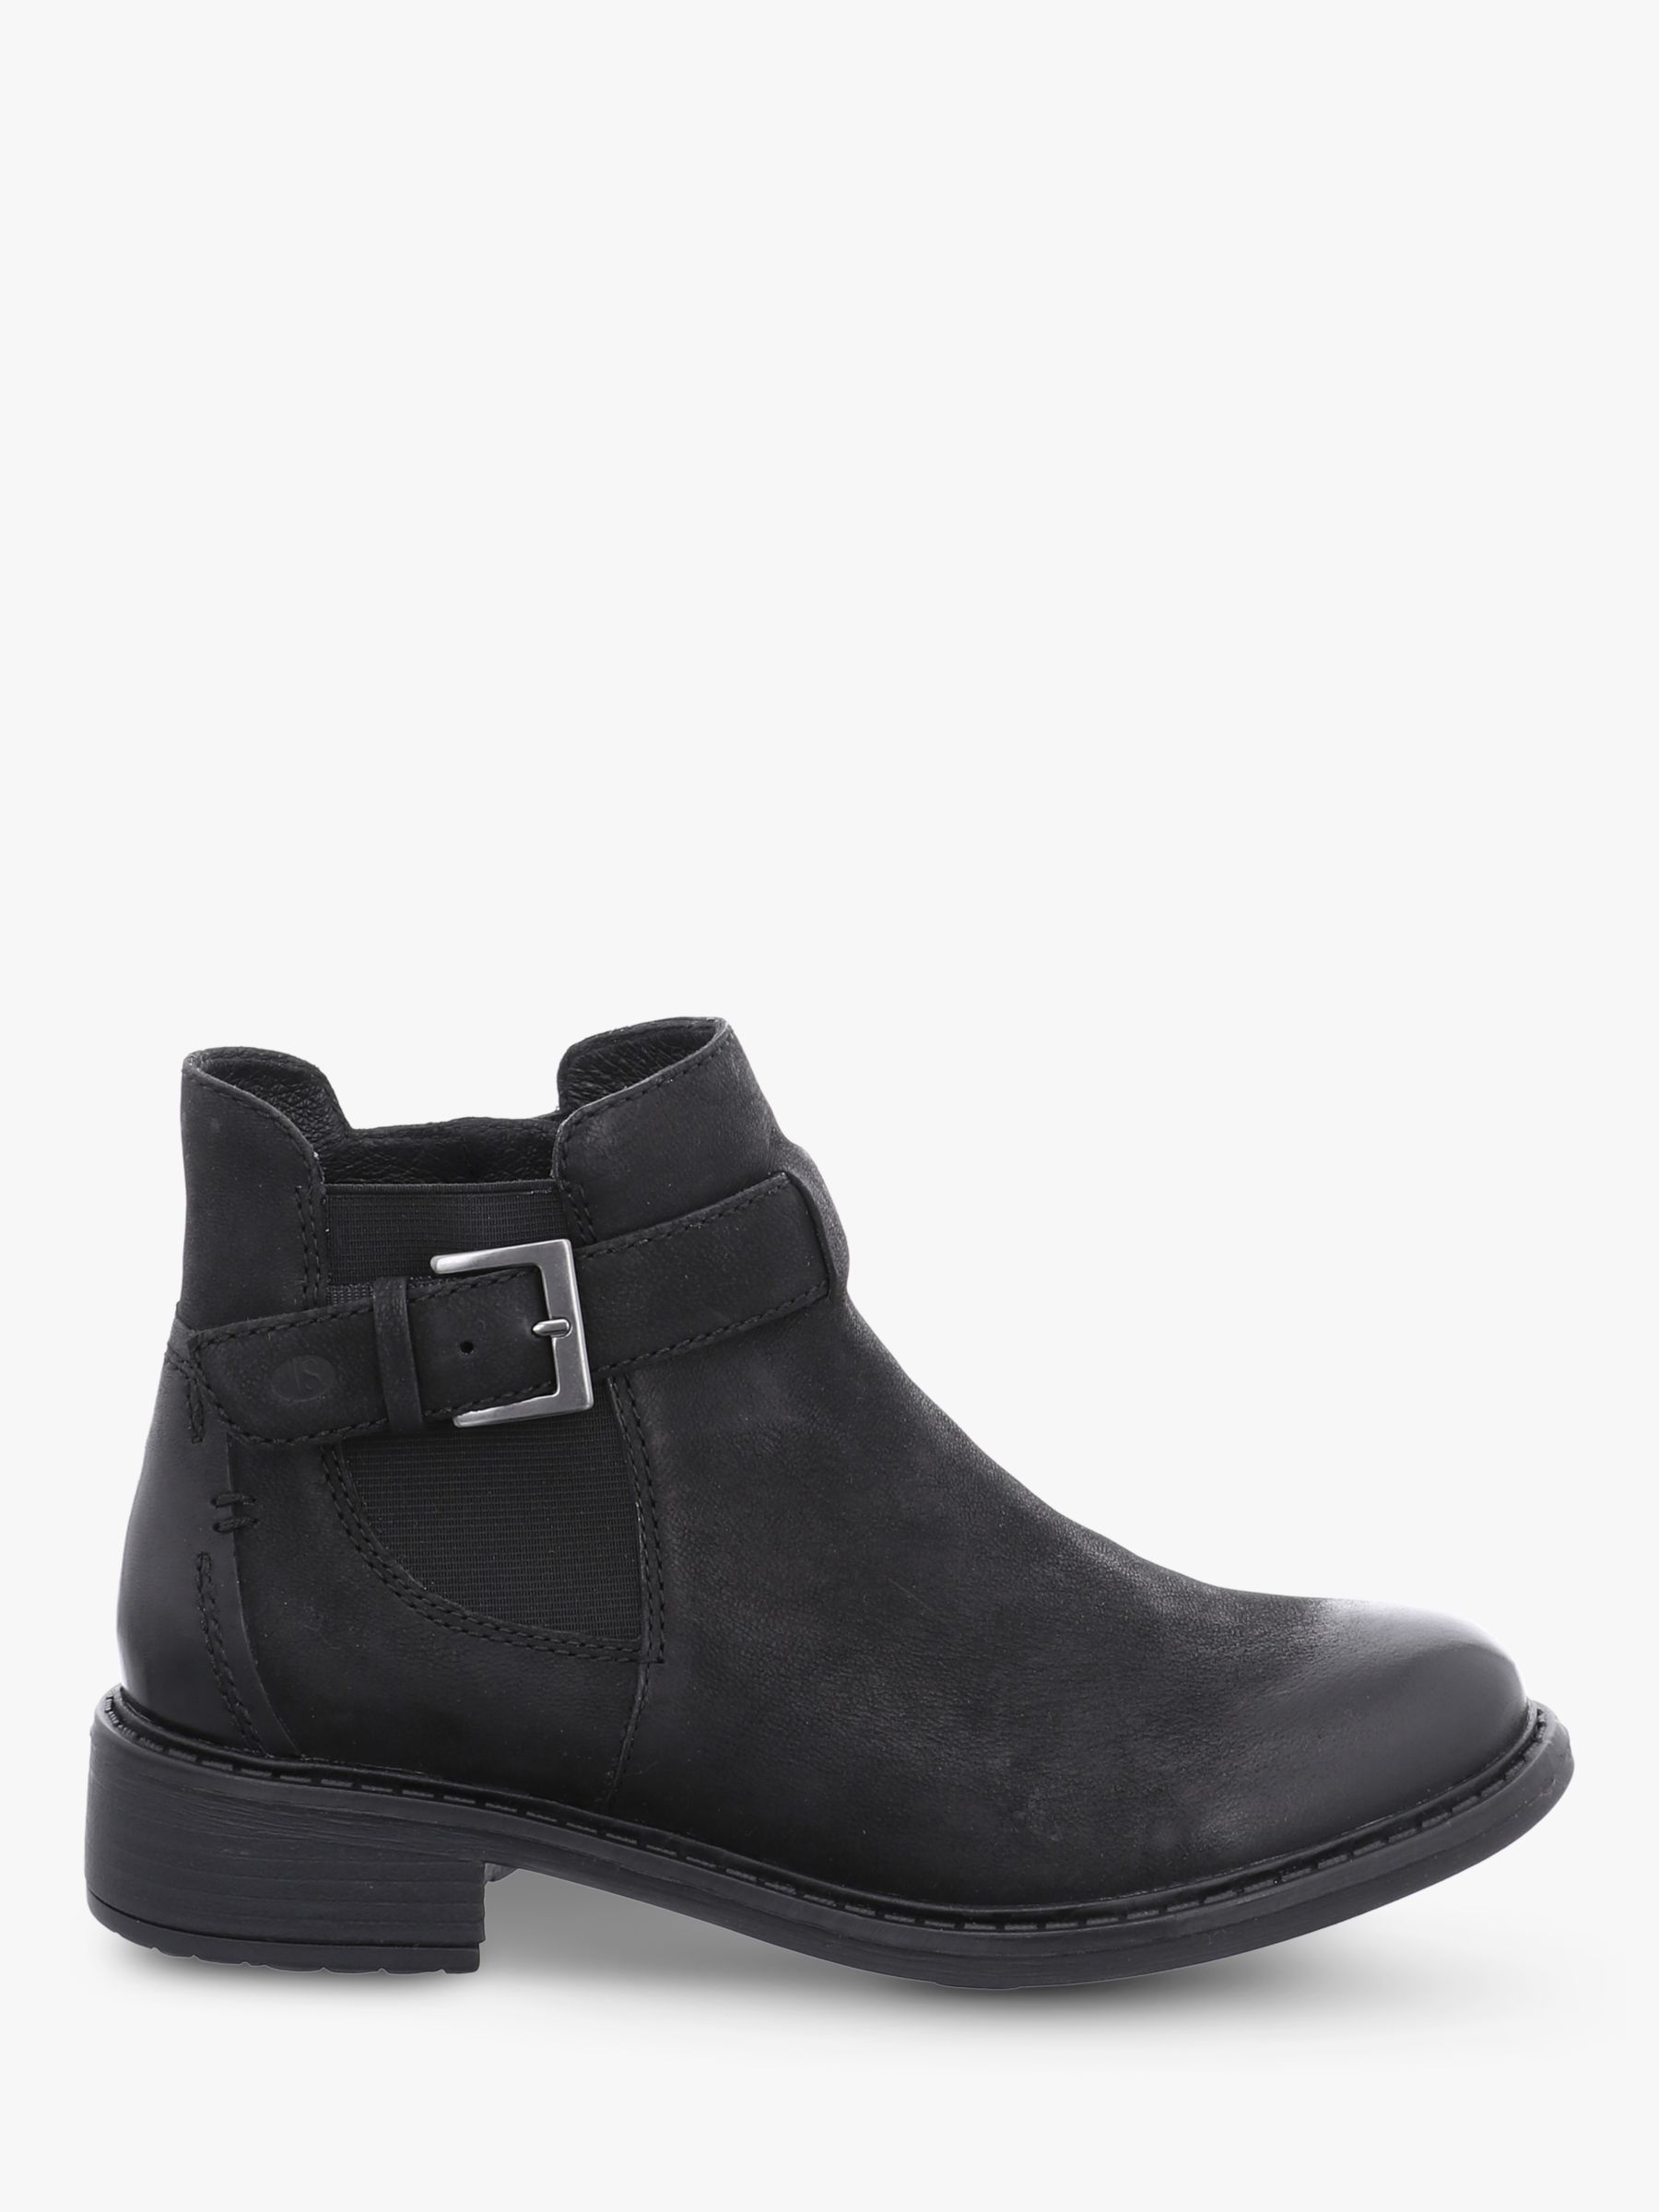 Josef Seibel Selena 17 Leather Block Heel Ankle Boots, Schwarz